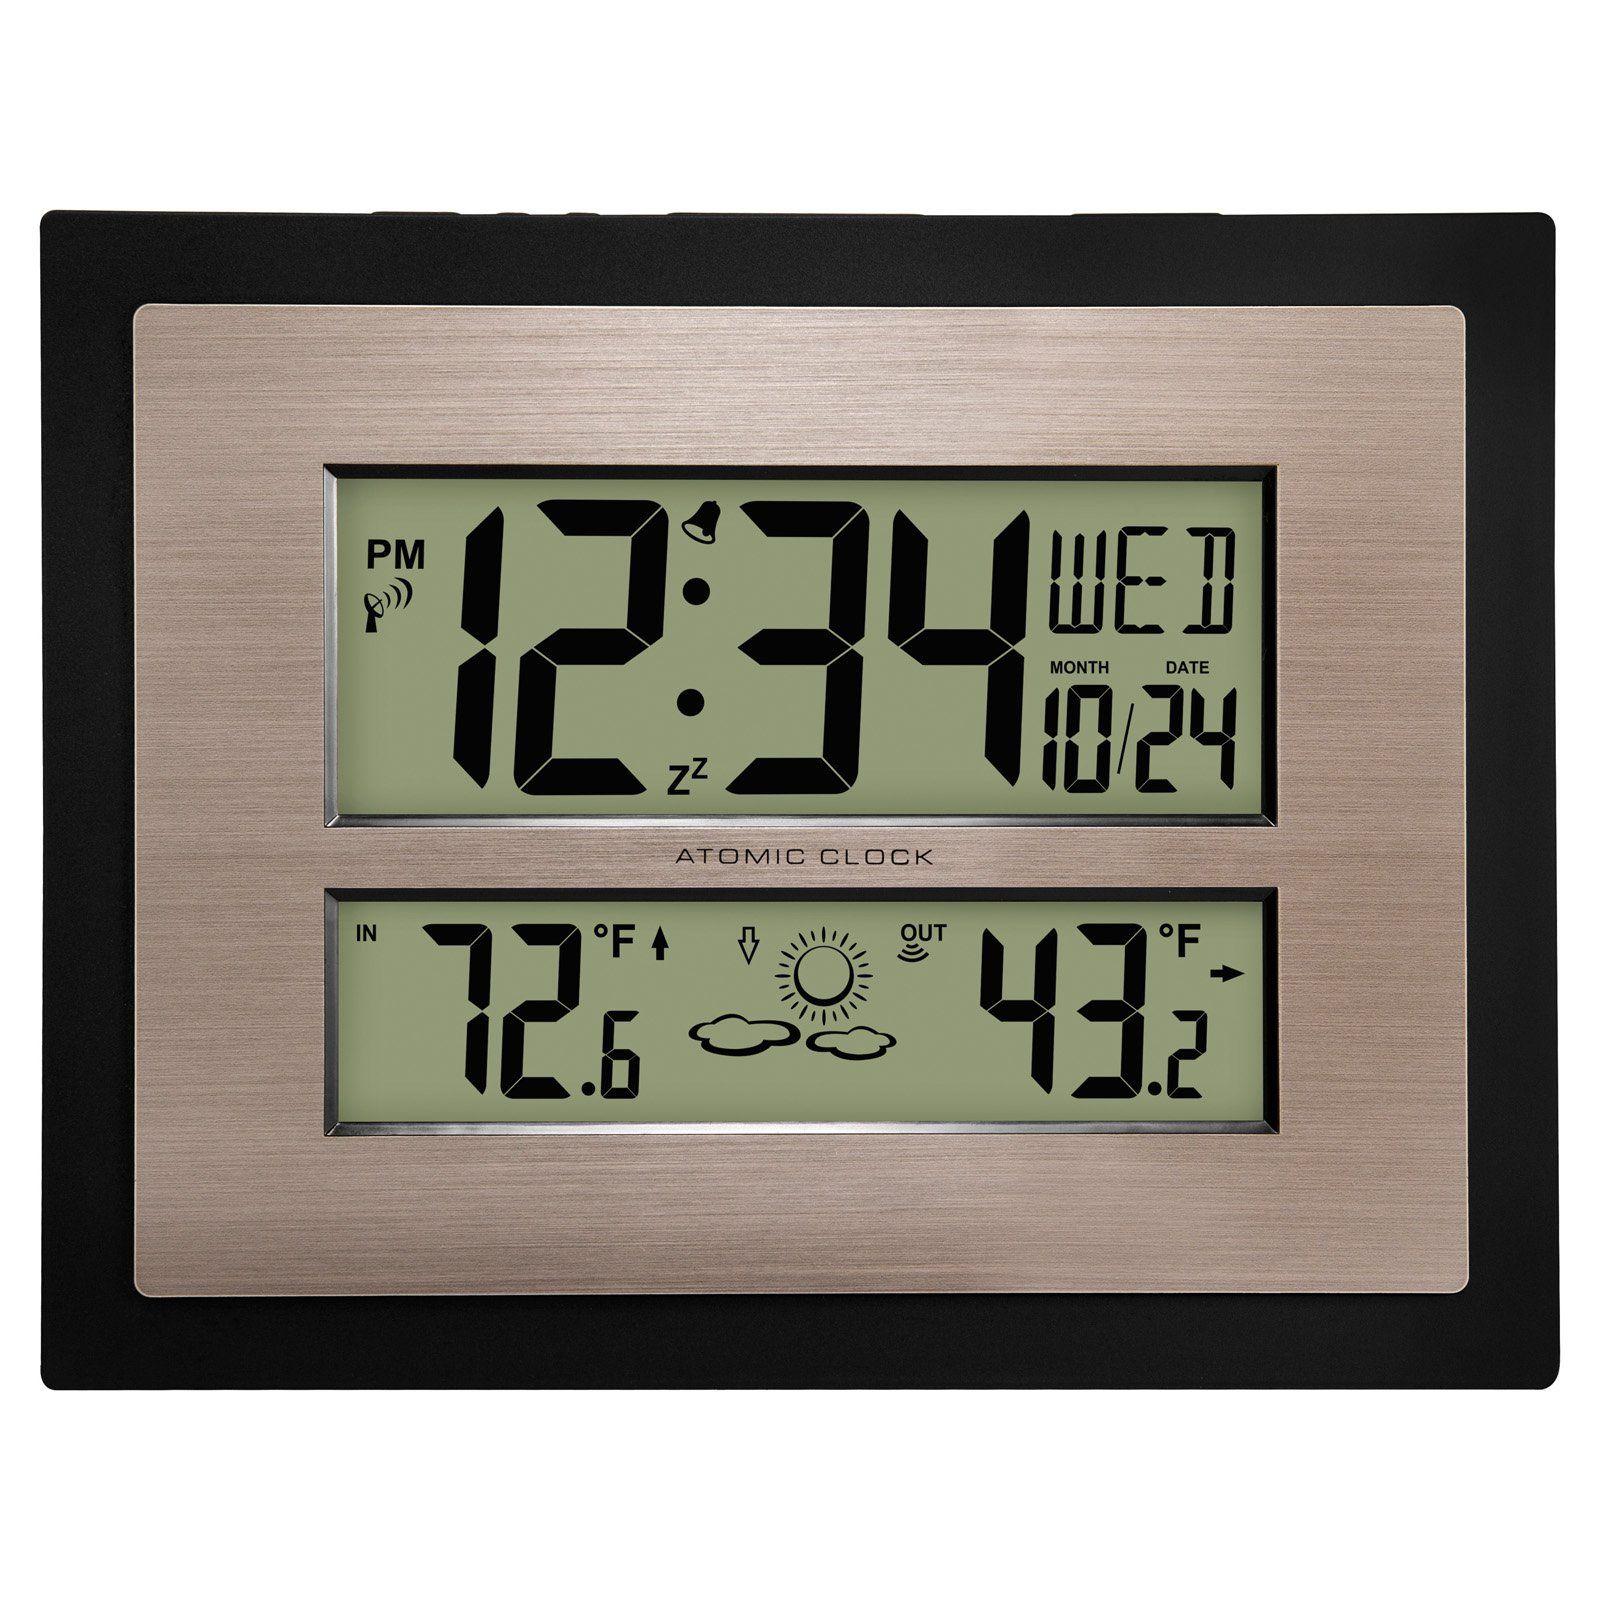 c3ea68317877aedc701baa64a5e42e76 - Better Homes & Gardens Digital Atomic Clock